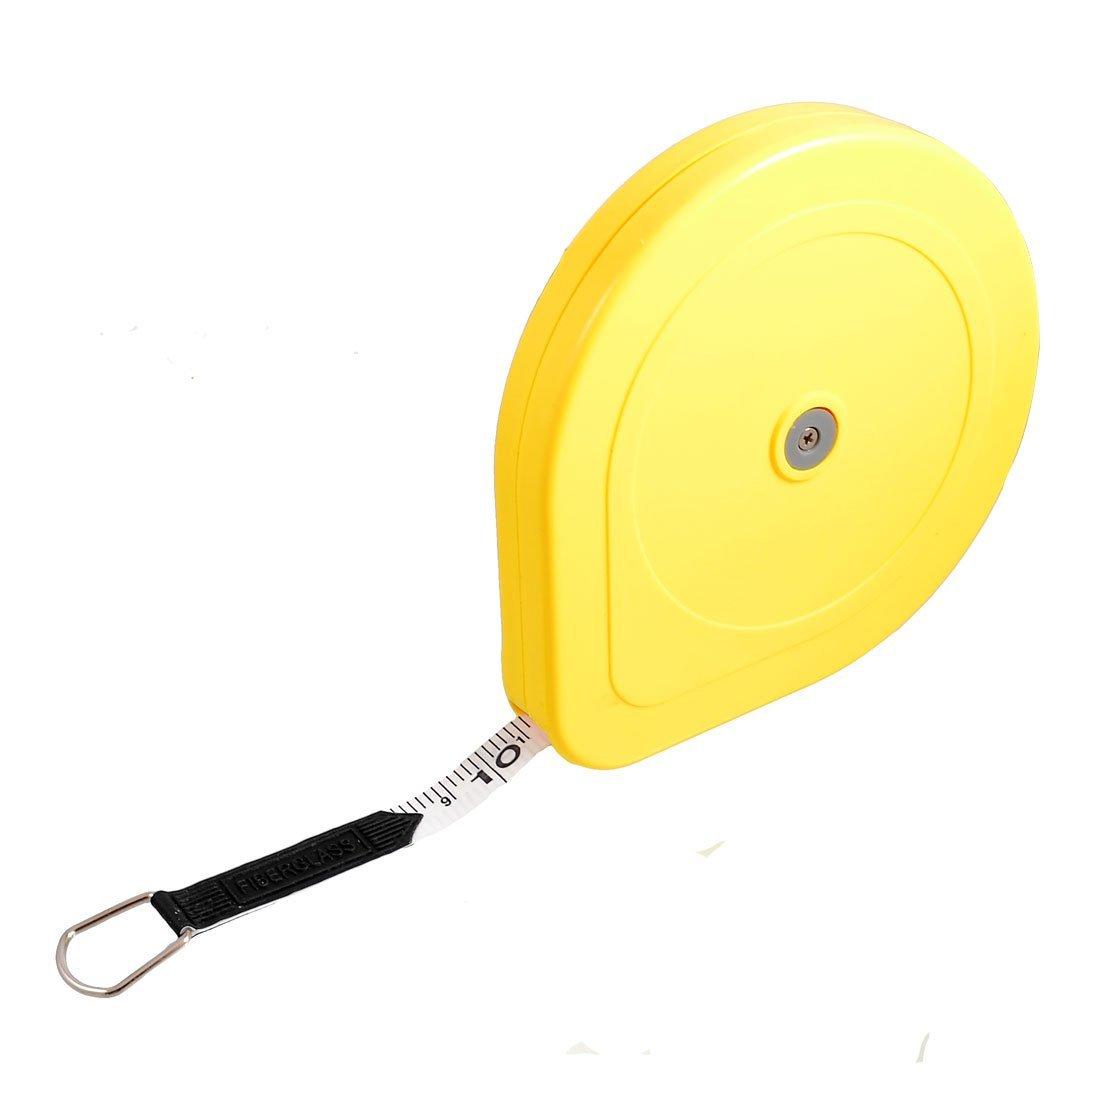 uxcell 20M x 13mm Metric Retractable Fiberglass Measuring Tape Ruler Yellow